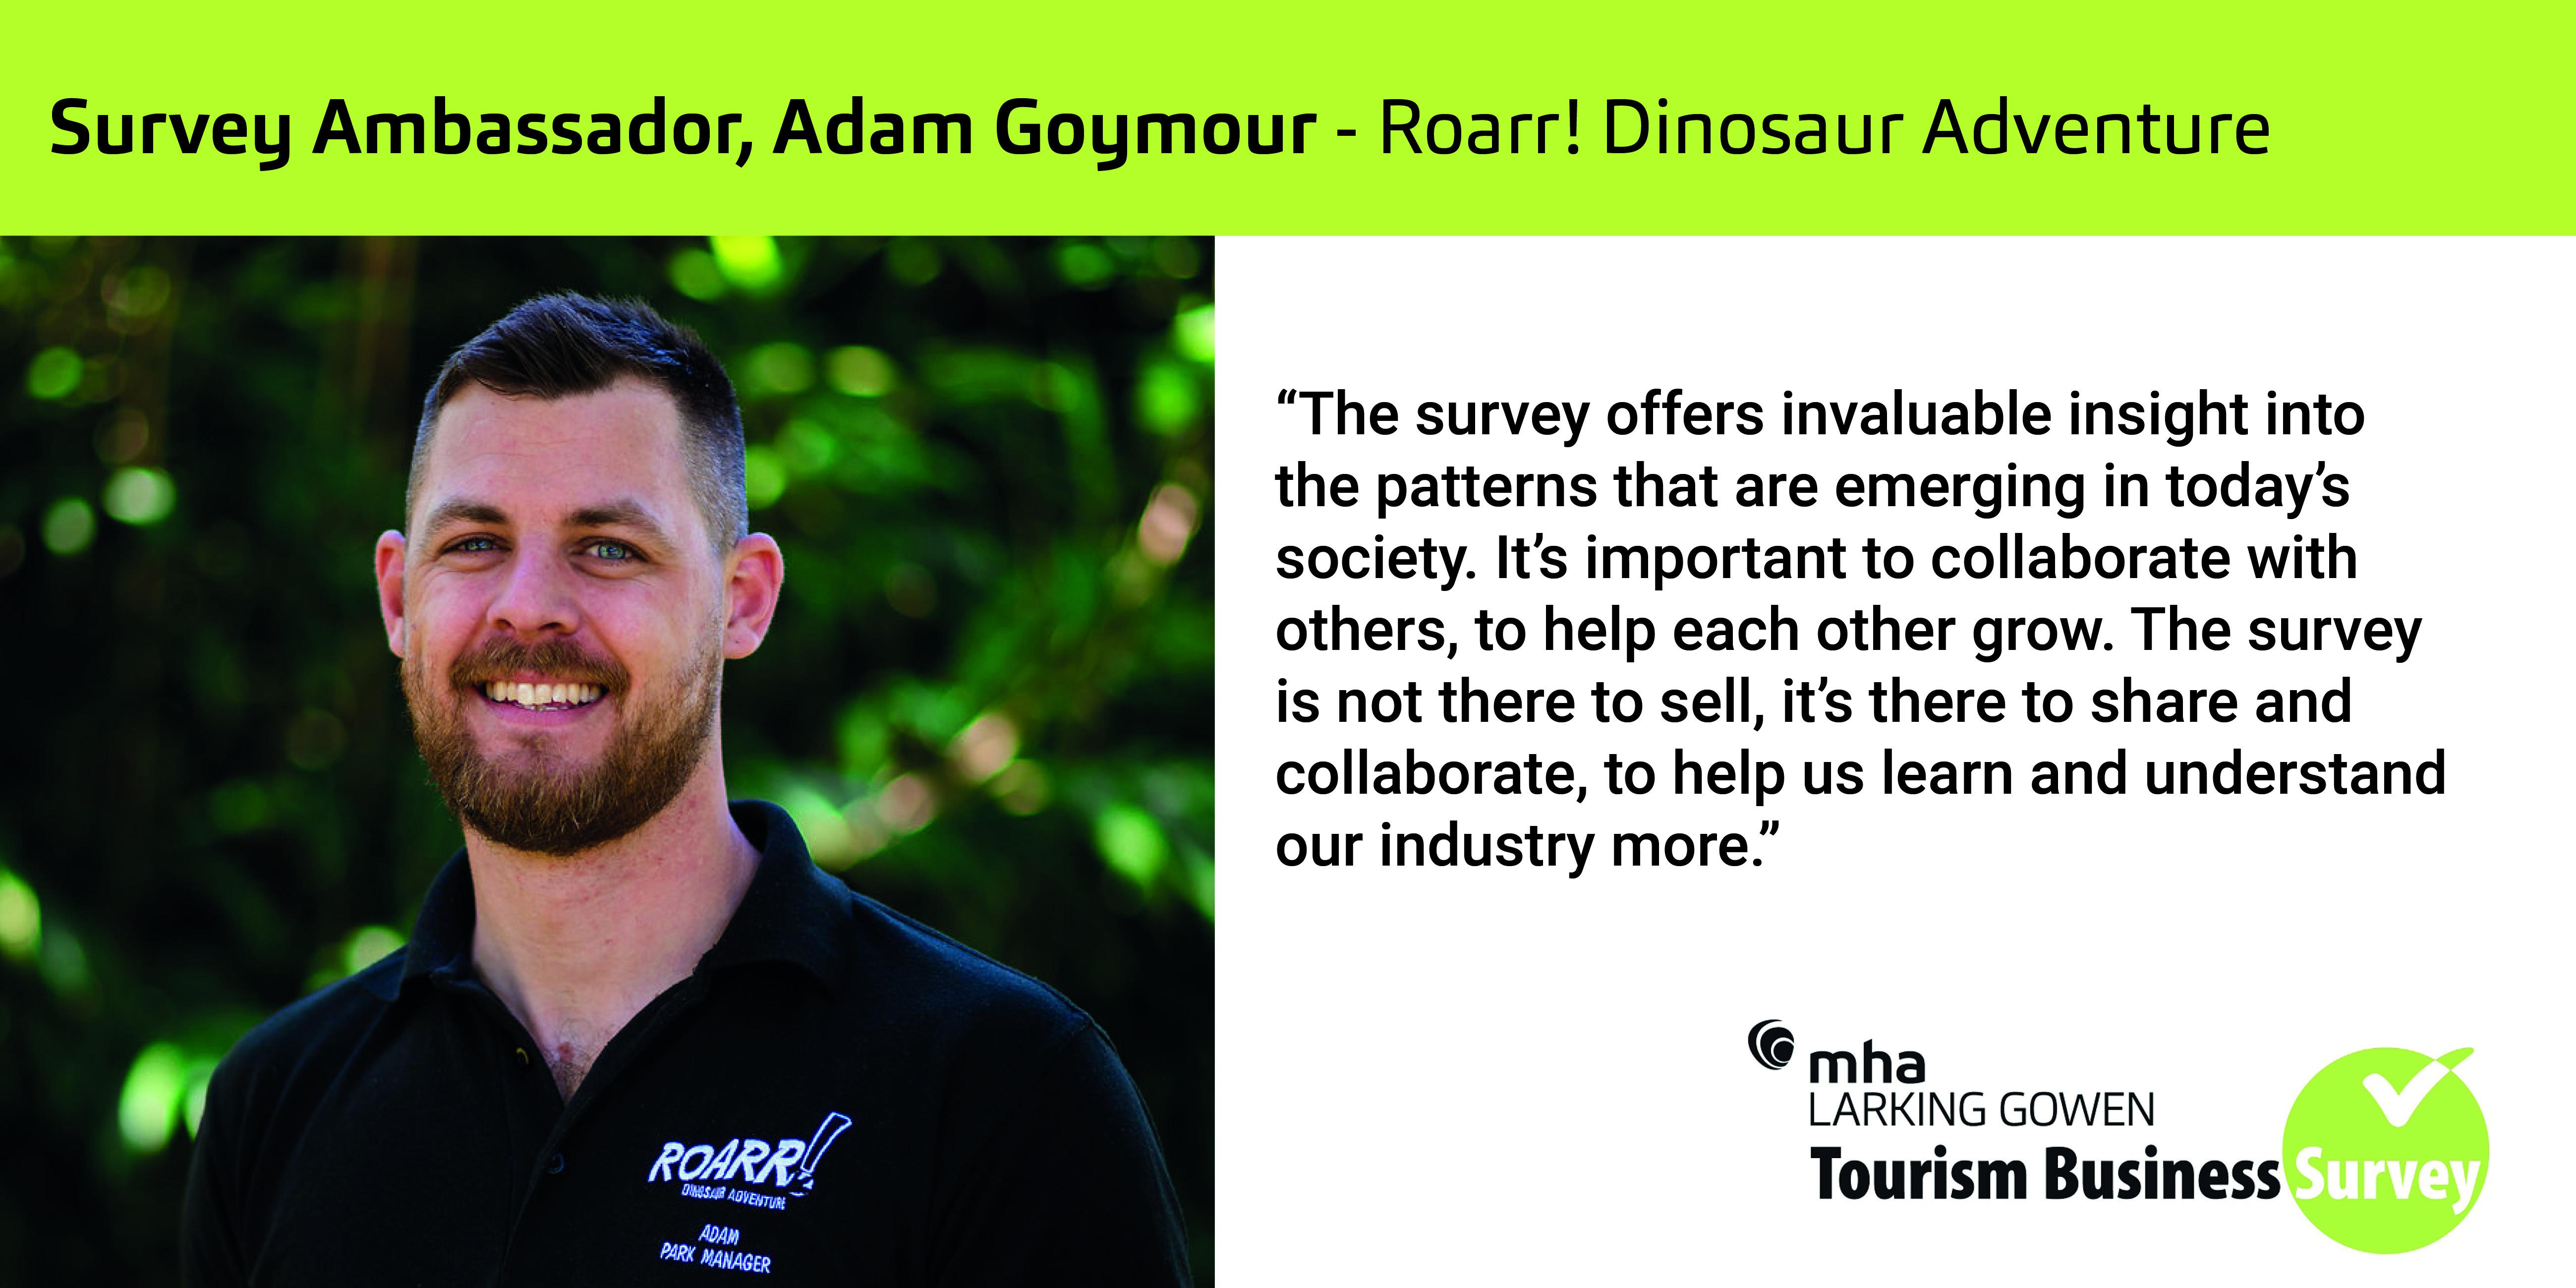 Survey-ambassedor-slide-Adam-Goymour